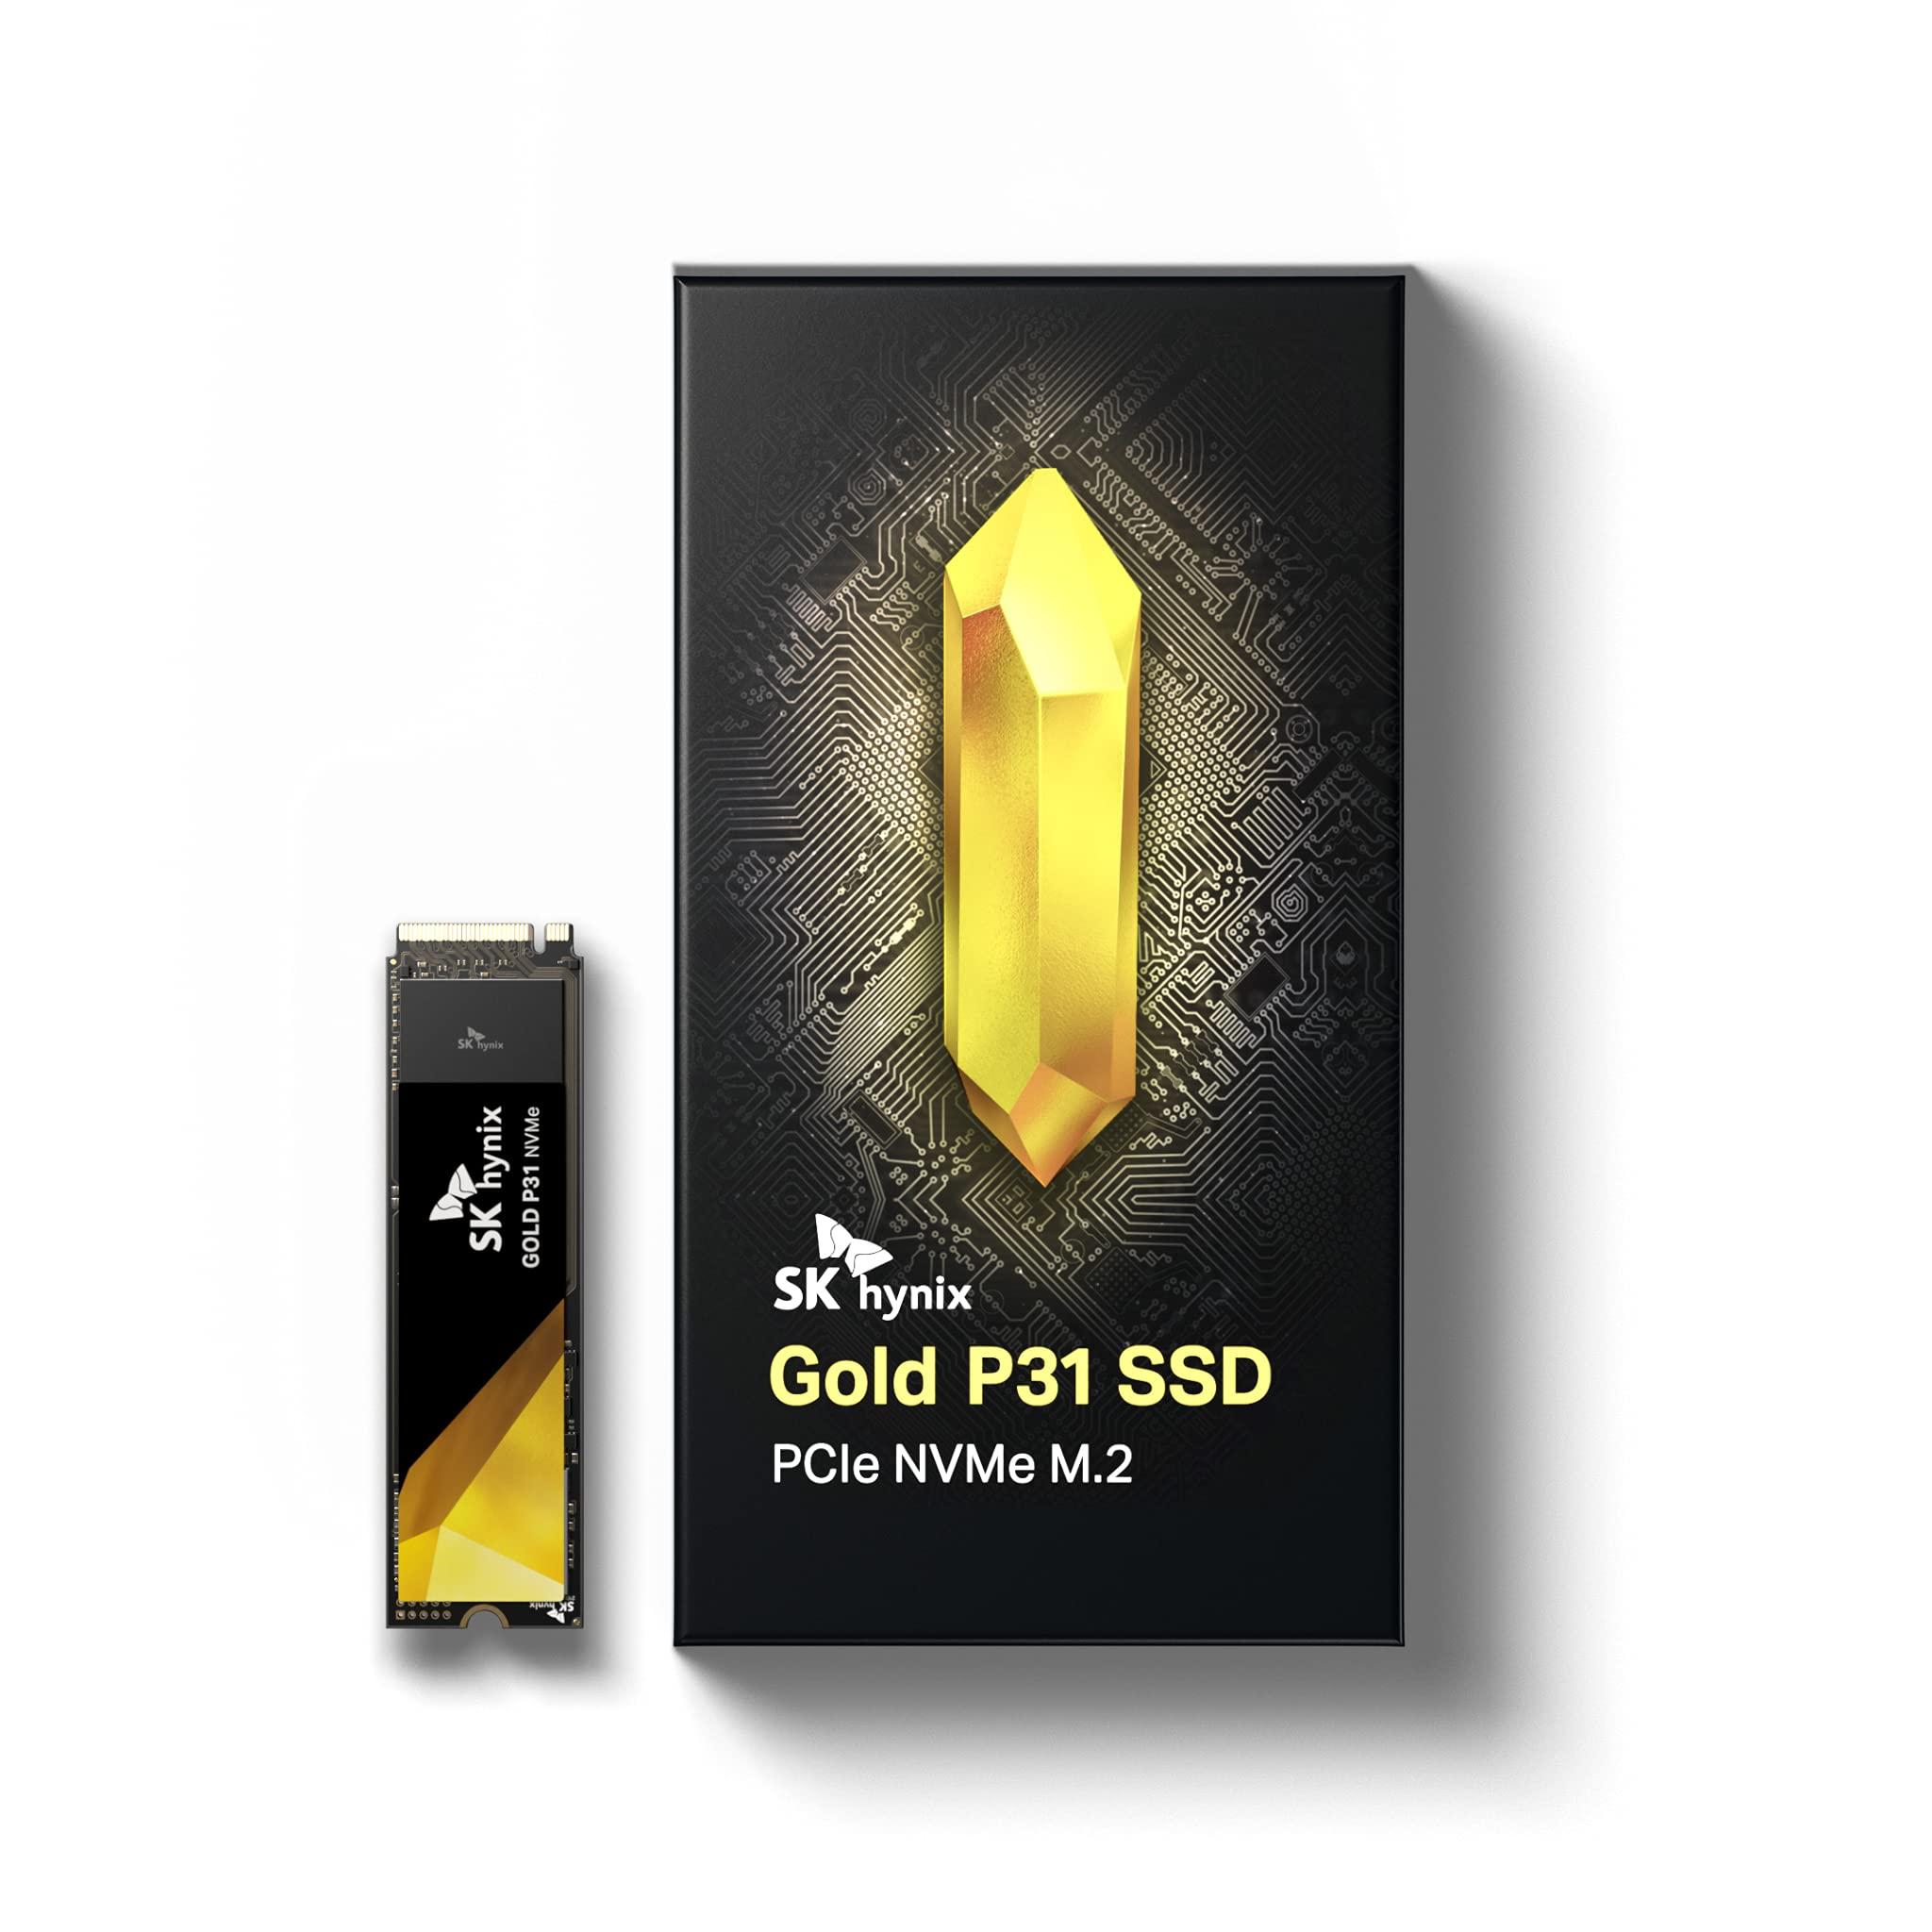 SK hynix Gold P31 2TB PCIe NVMe Gen3 M.2 2280 Internal SSD l Up to 3500MB/S l Compact M.2 SSD $245 Amazon $245